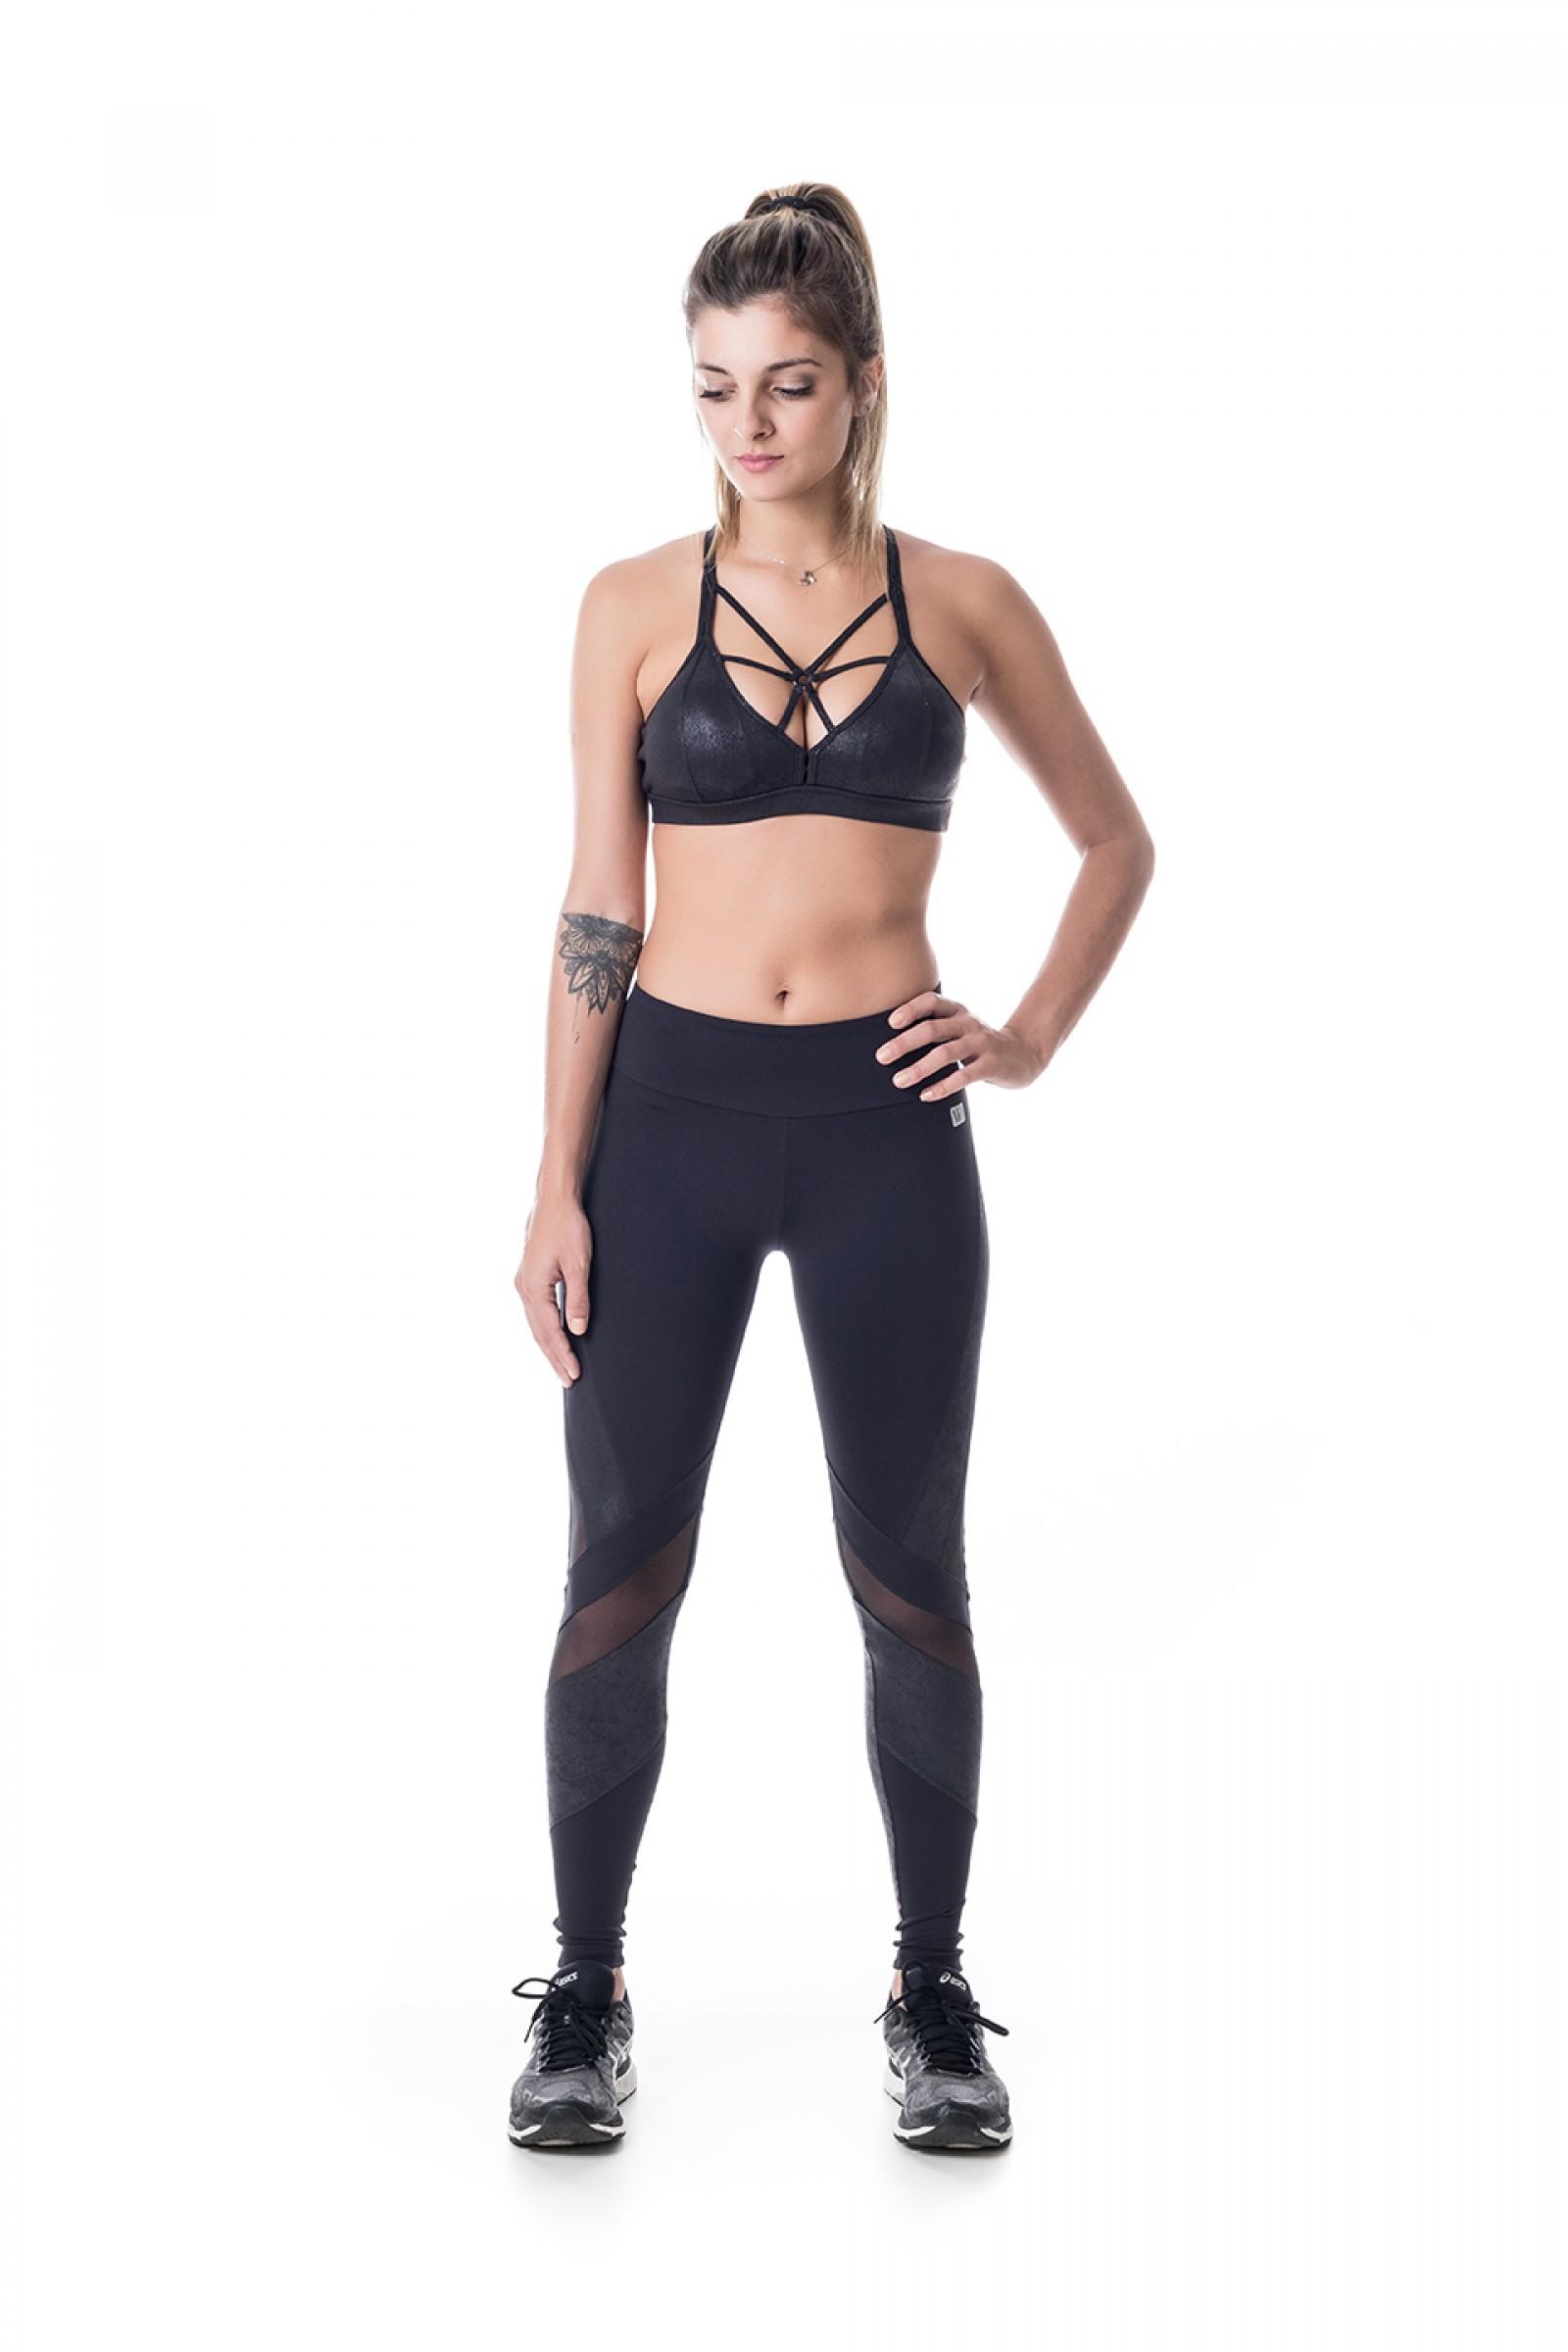 Top Bring Preto Crak, Coleção Challenge - NKT Fitwear Moda Fitness